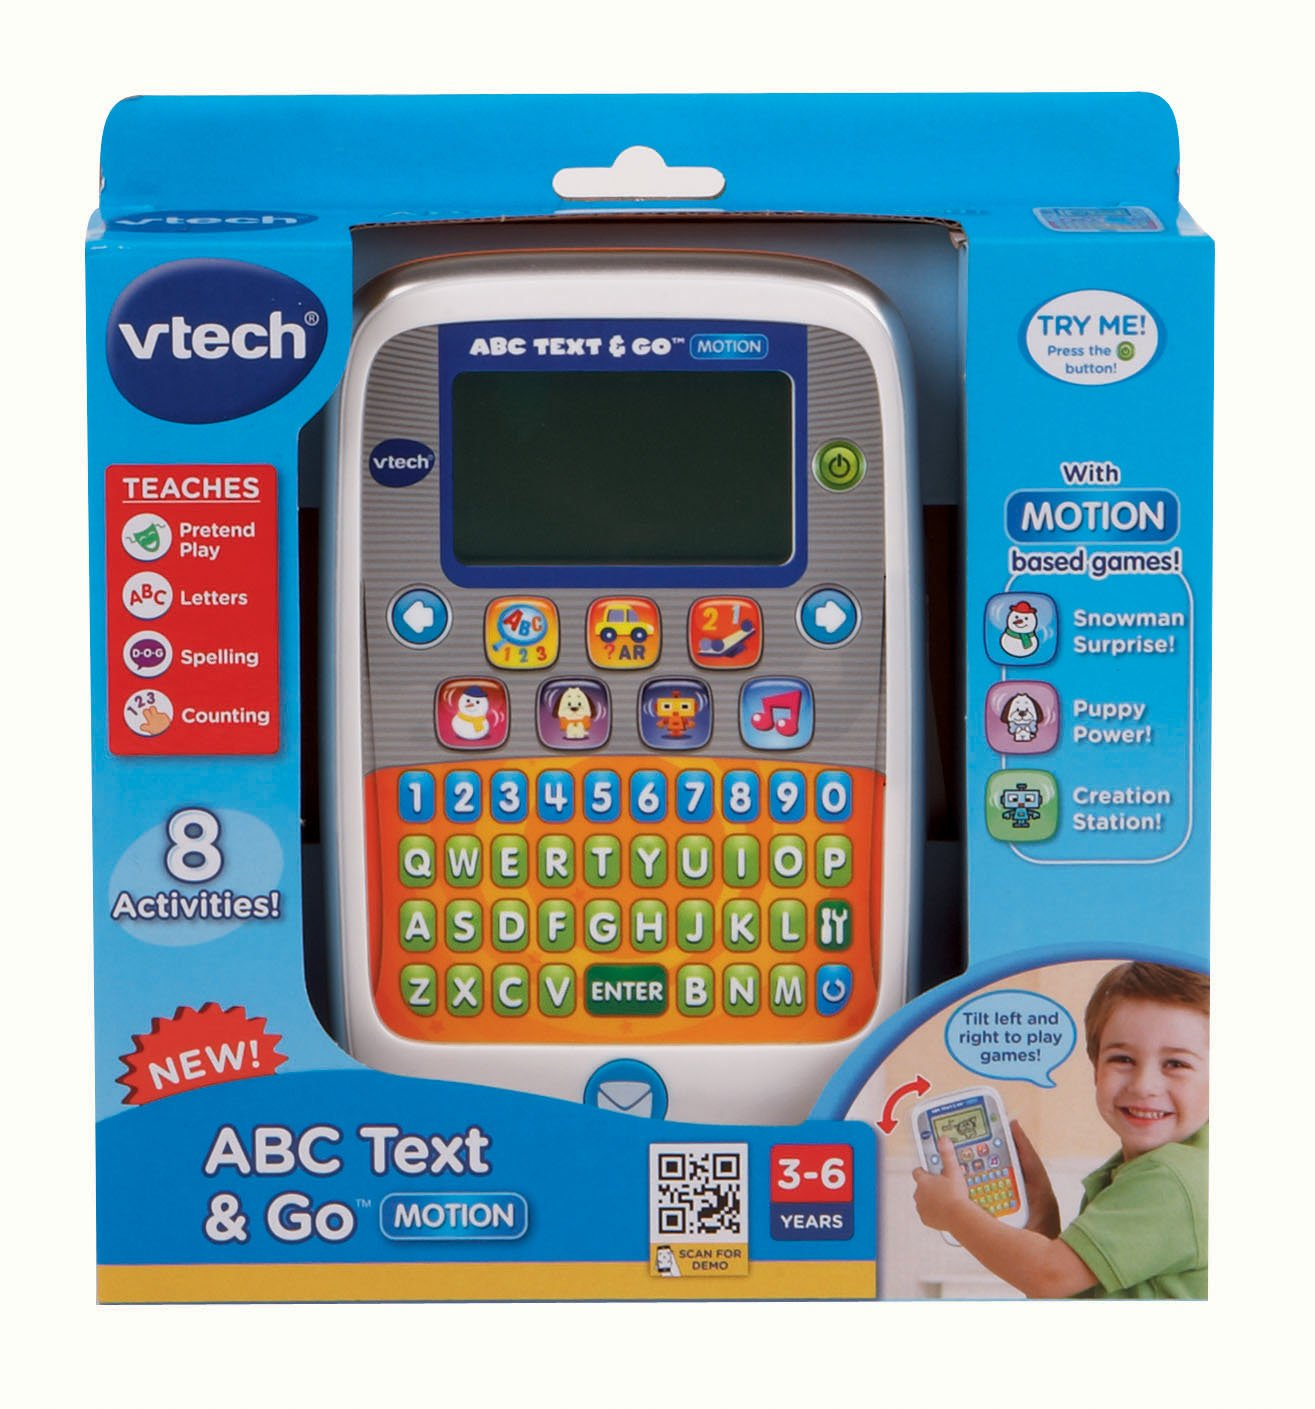 VTech ABC Text and Go Motion Orange